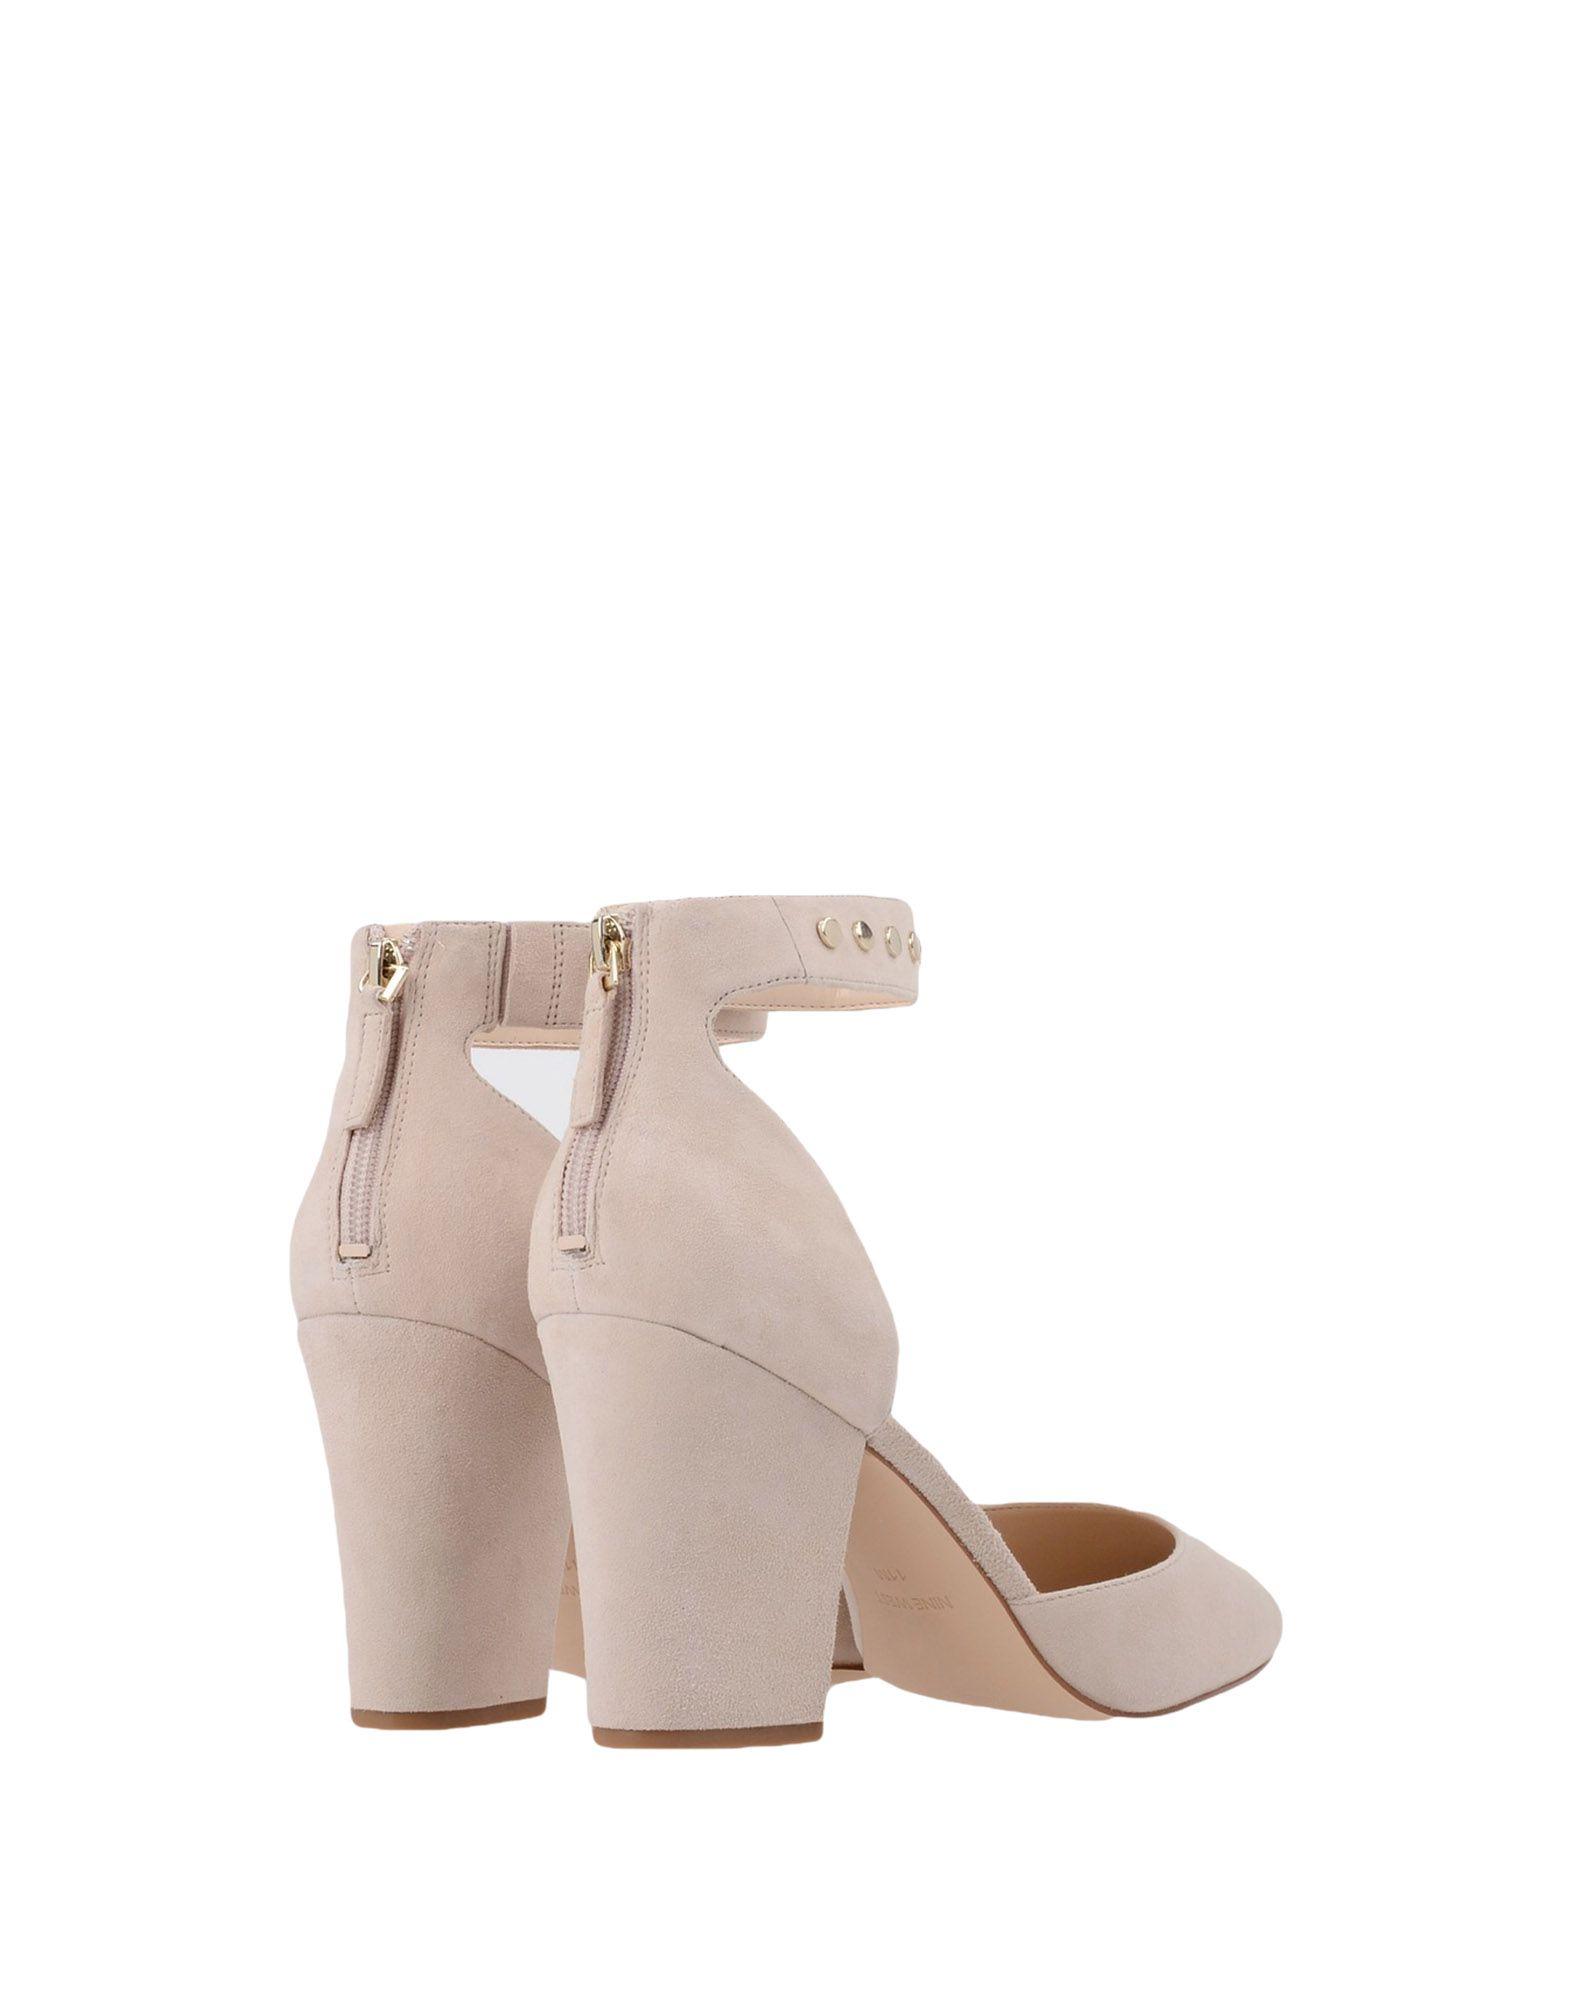 Nine West Pumps Damen  11330748RE 11330748RE  Gute Qualität beliebte Schuhe bd2212